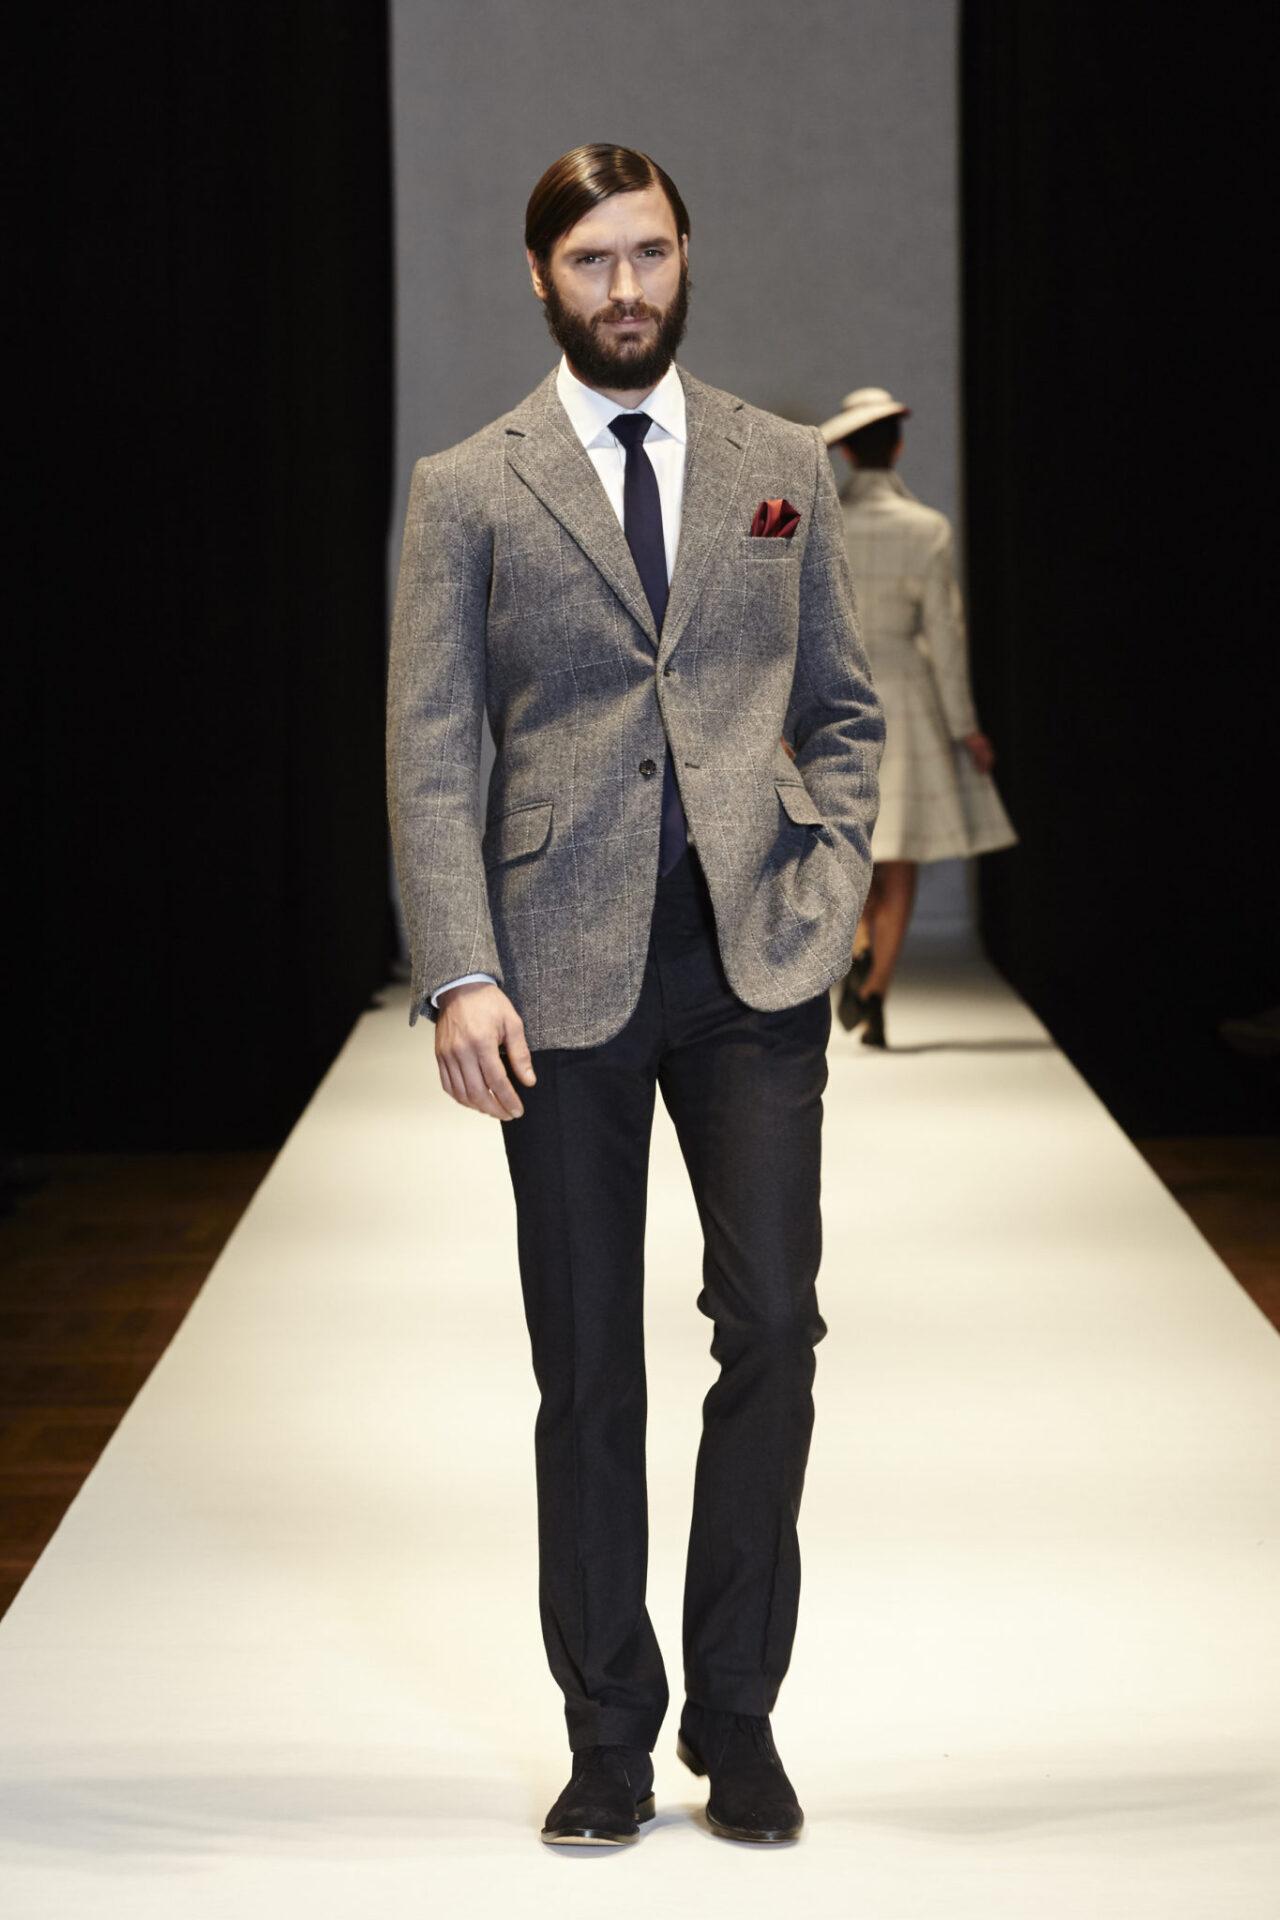 Skræddersyet jakke og bukser fra dansk skrædder Den